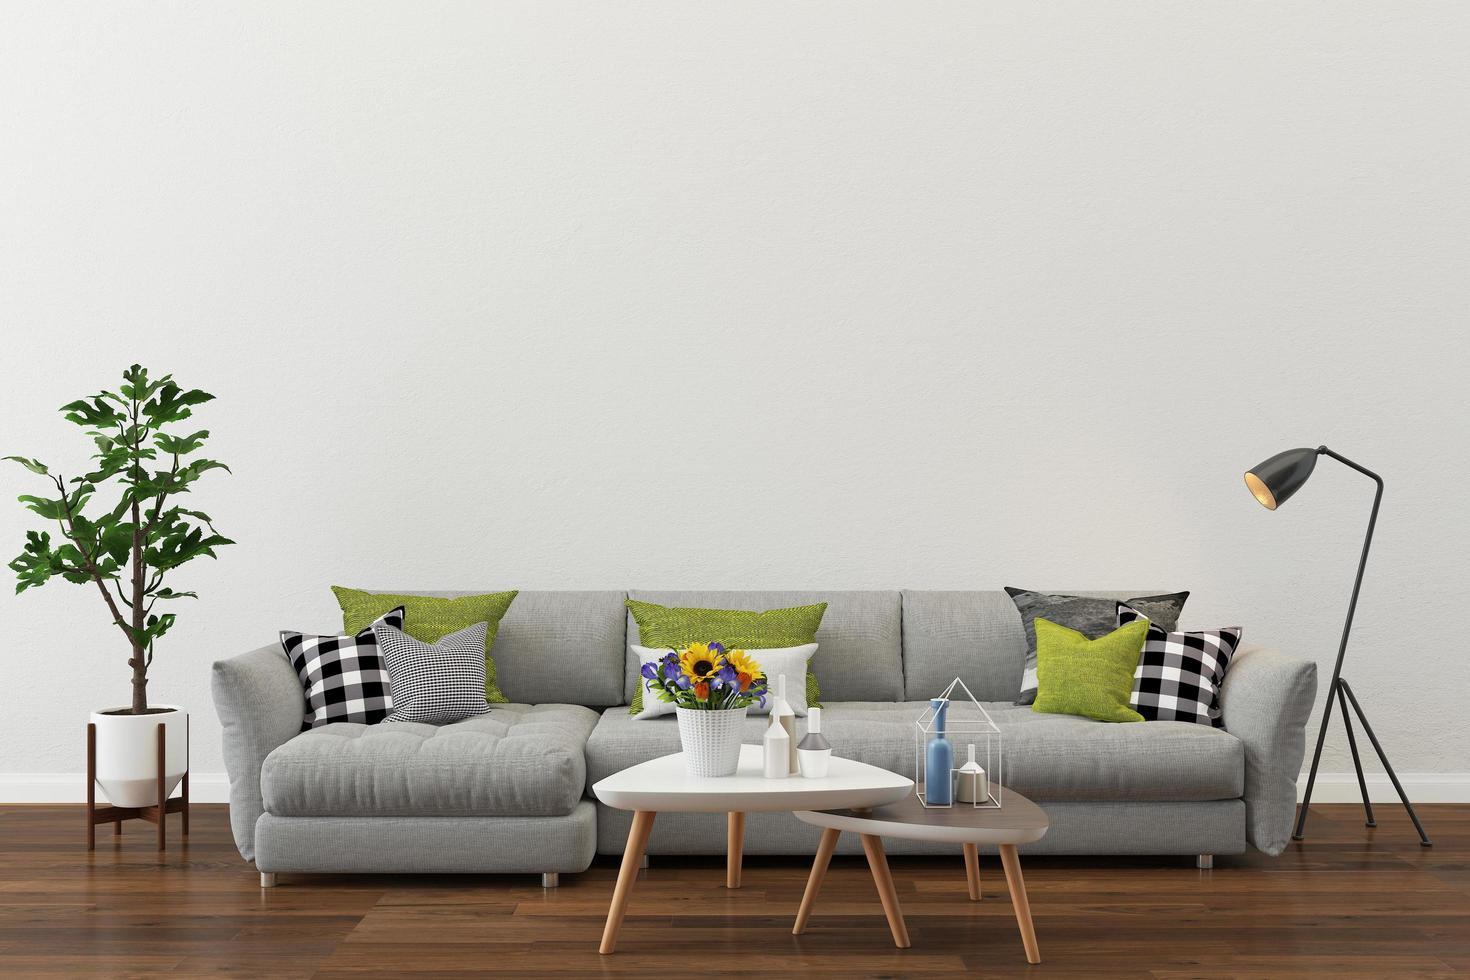 Modern living room setting photo